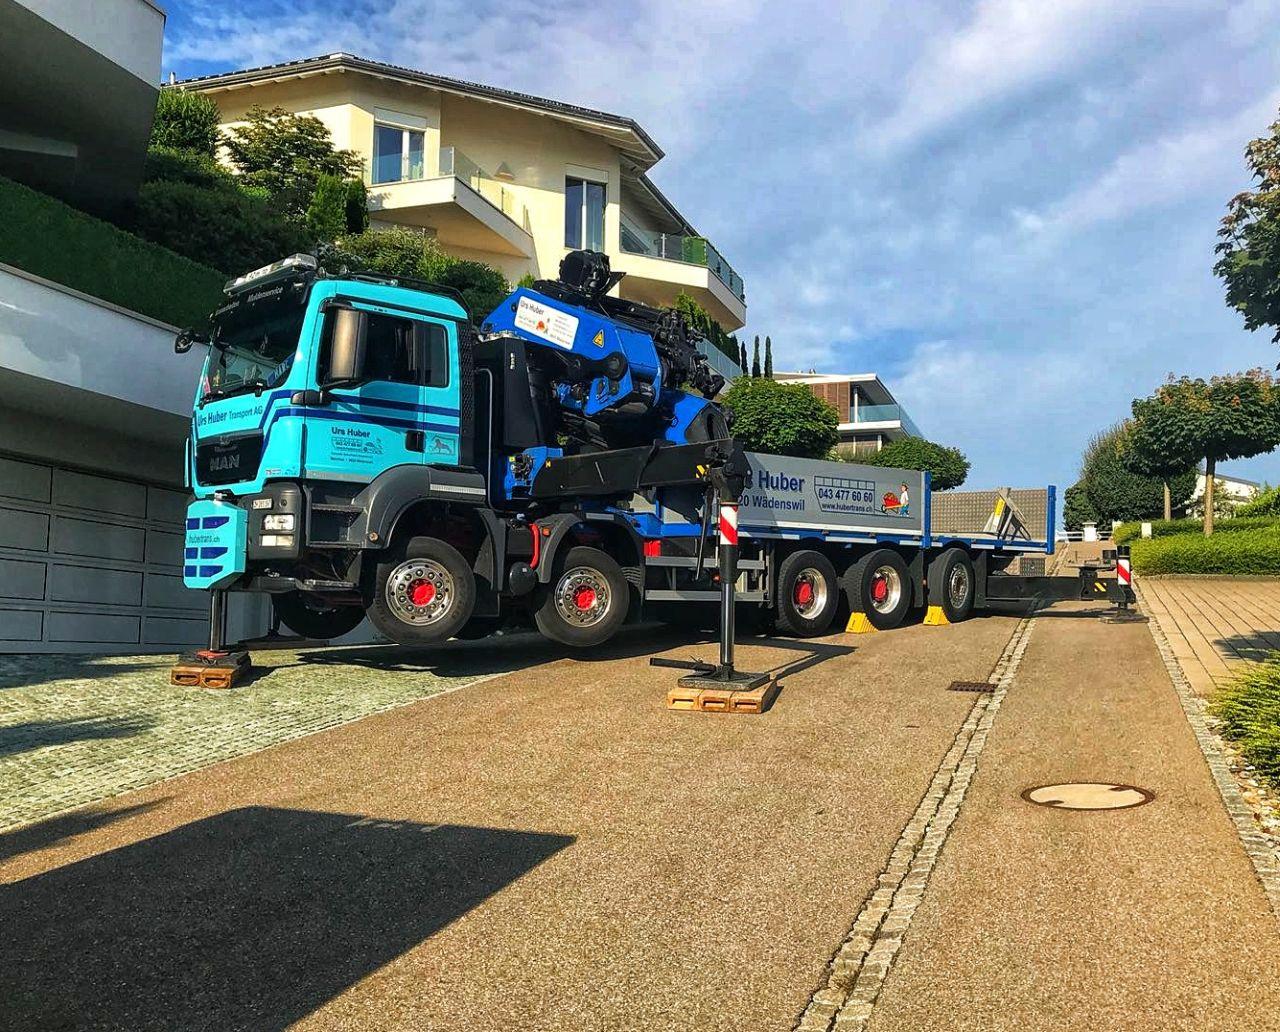 5-Achs-Kranwagen 35m Urs Huber Transport AG